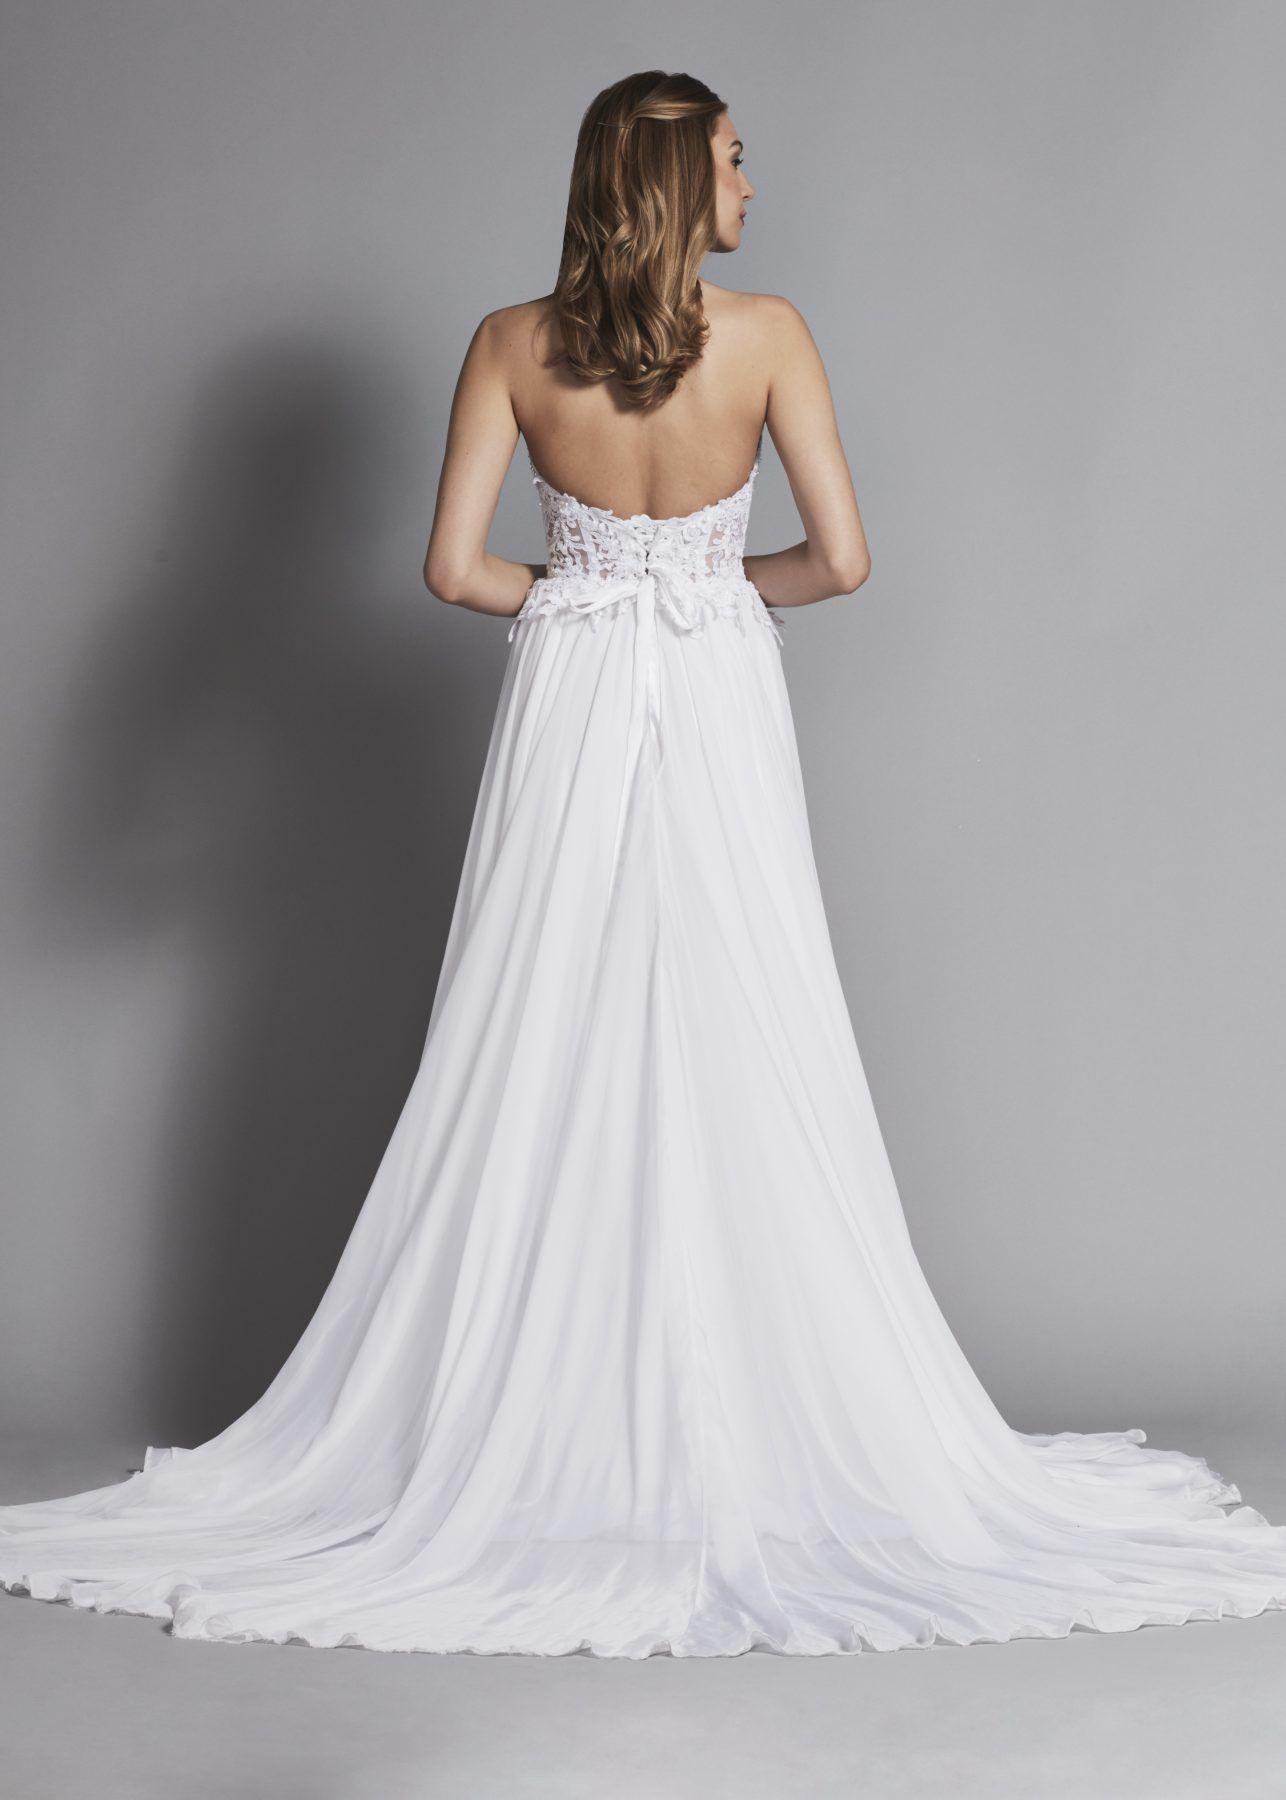 30+ Strapless lace wedding dress a line ideas